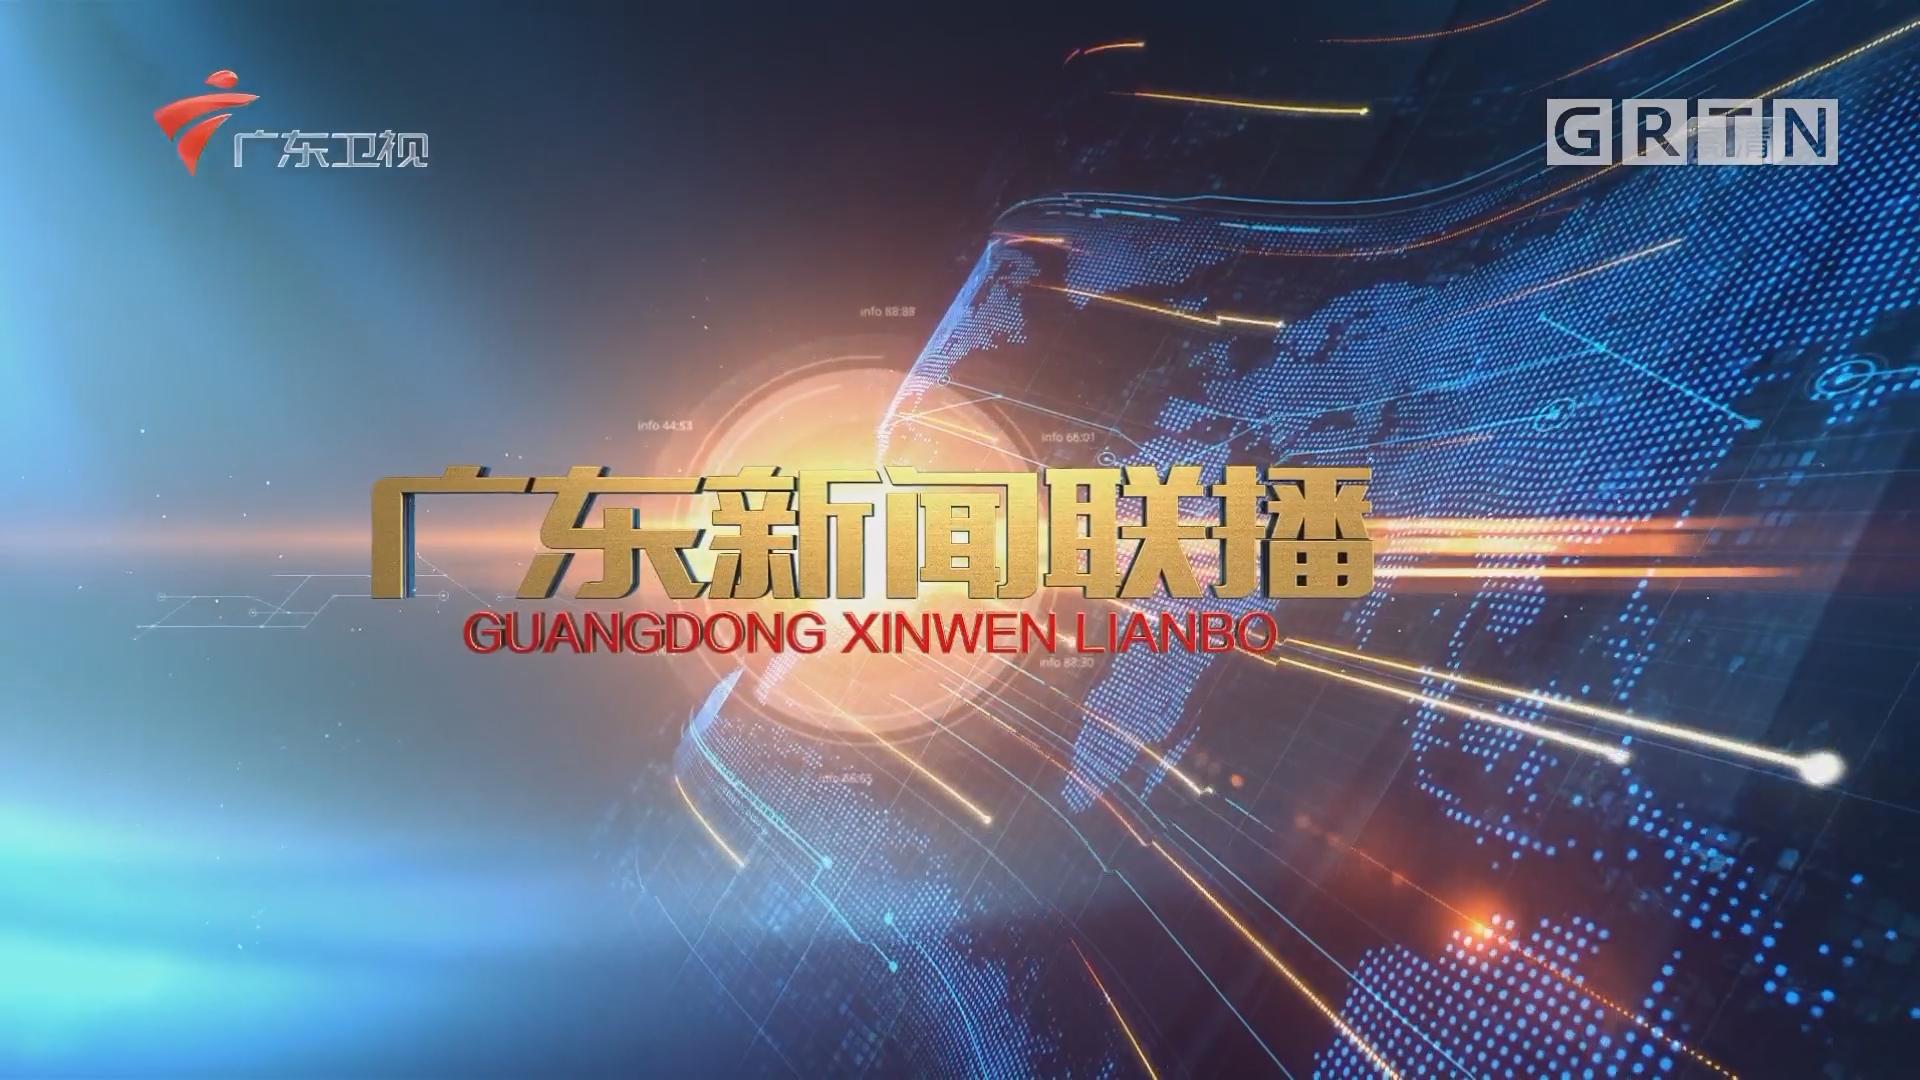 [HD][2019-05-12]广东新闻联播:潮州:加快大项目落地 助推高质量发展